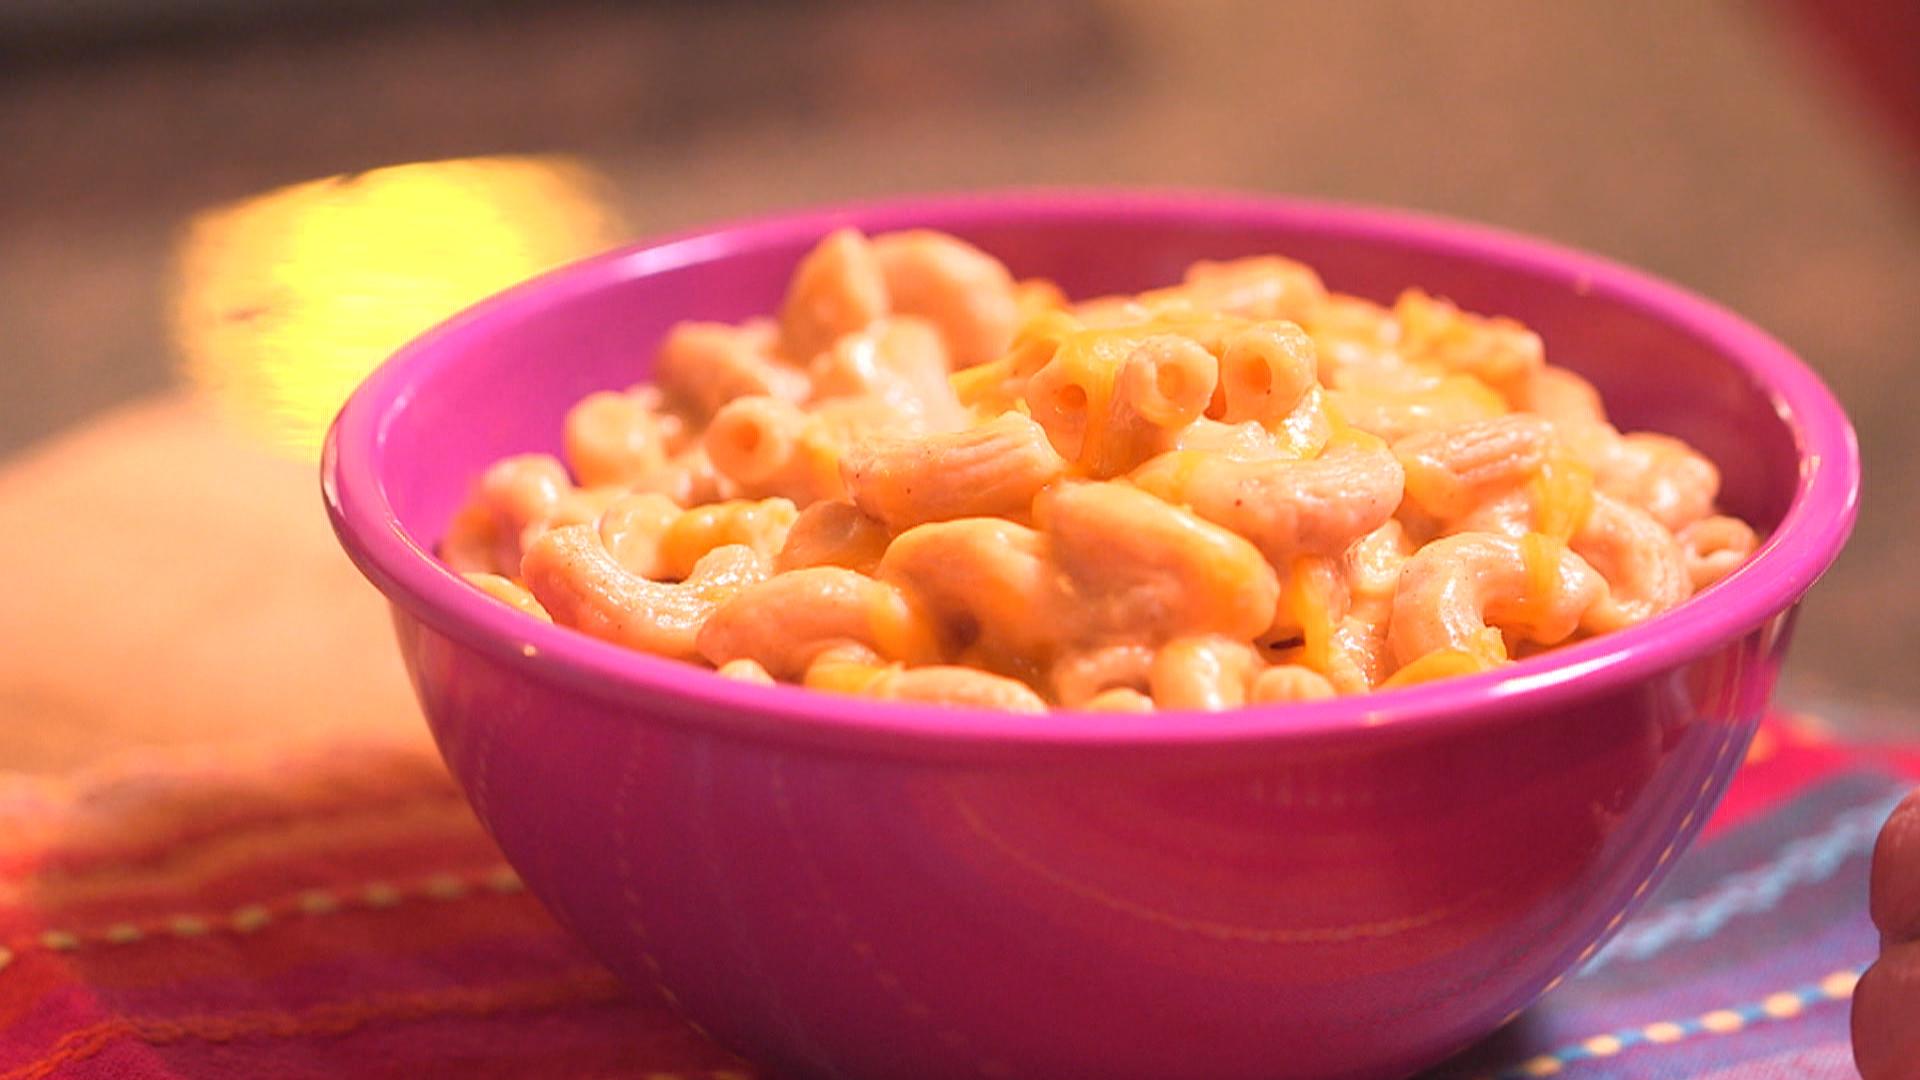 Joys Healthier Mac n Cheese advise